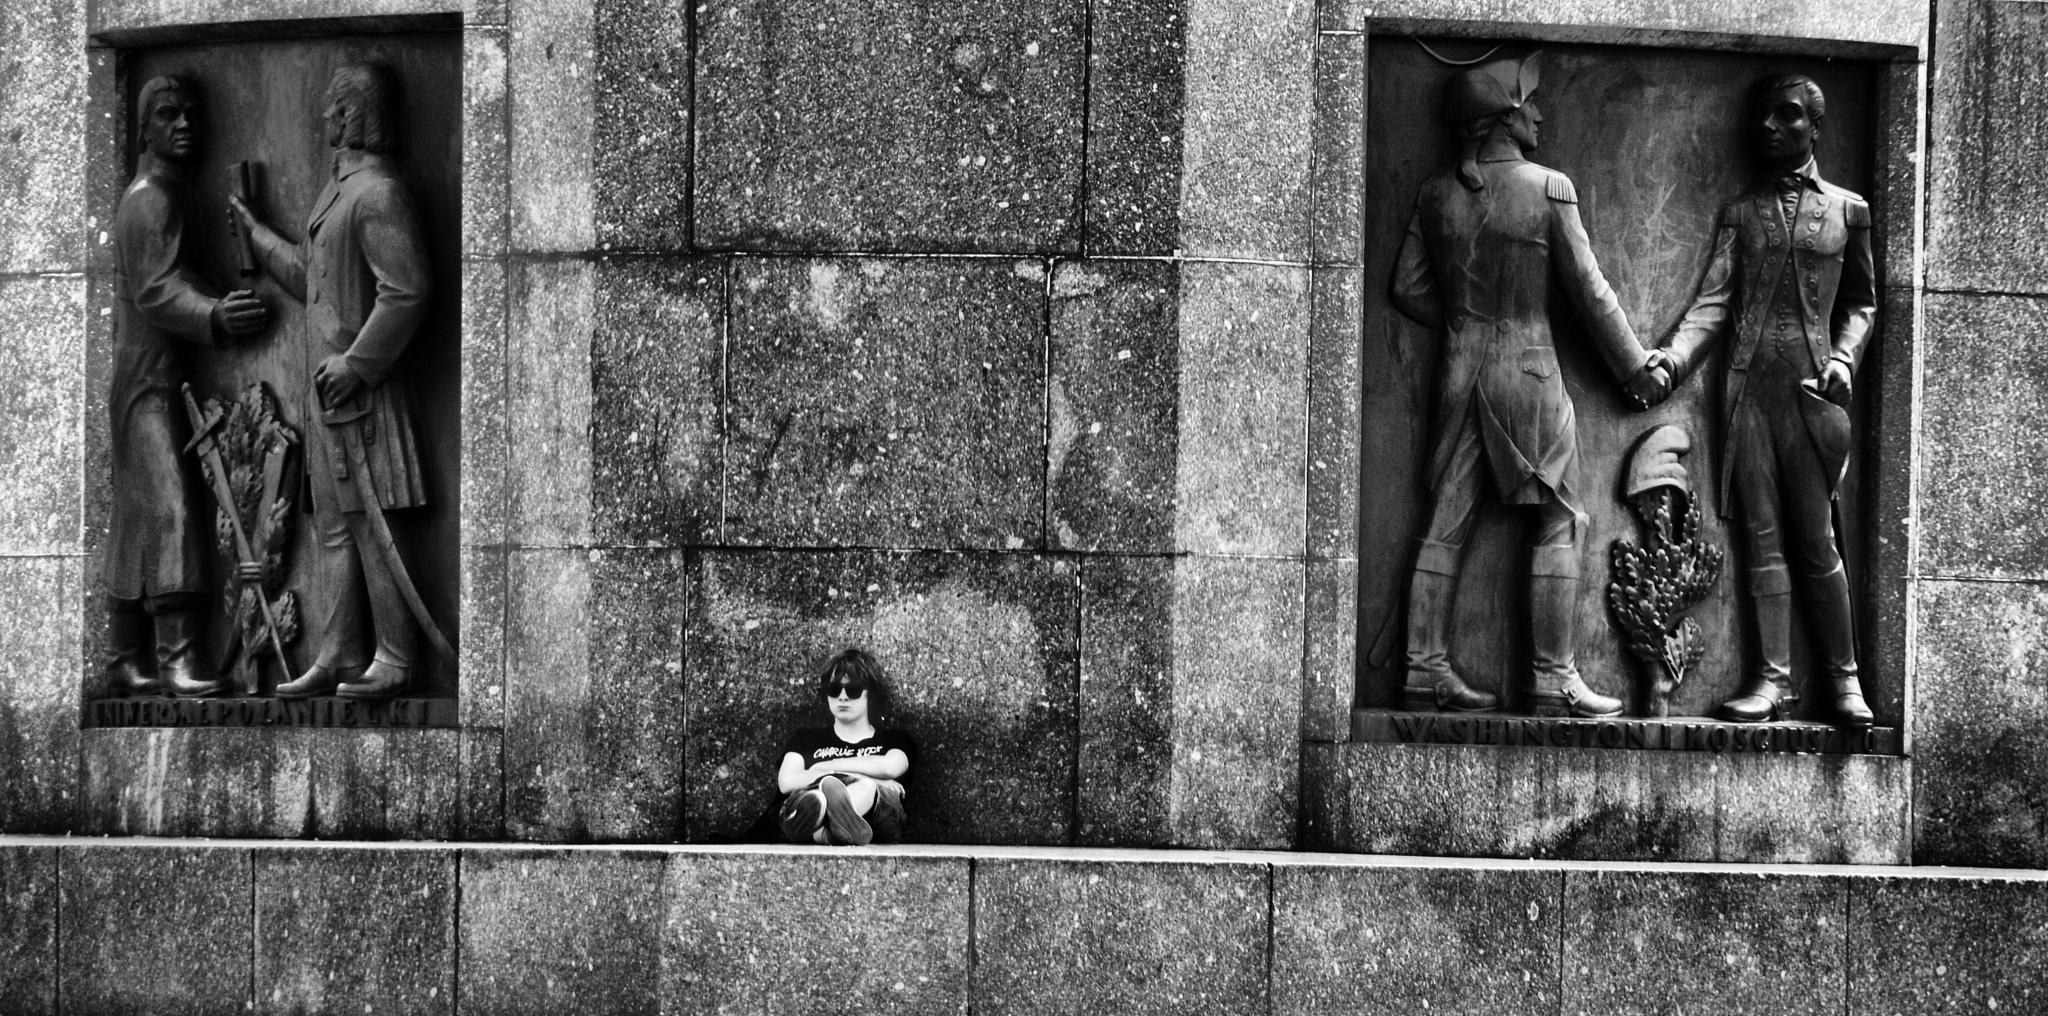 Lodz, Freedom Square, Kosciuszko Monument, on the right of Washington and Kosciuszko by piotr.b.tubylec